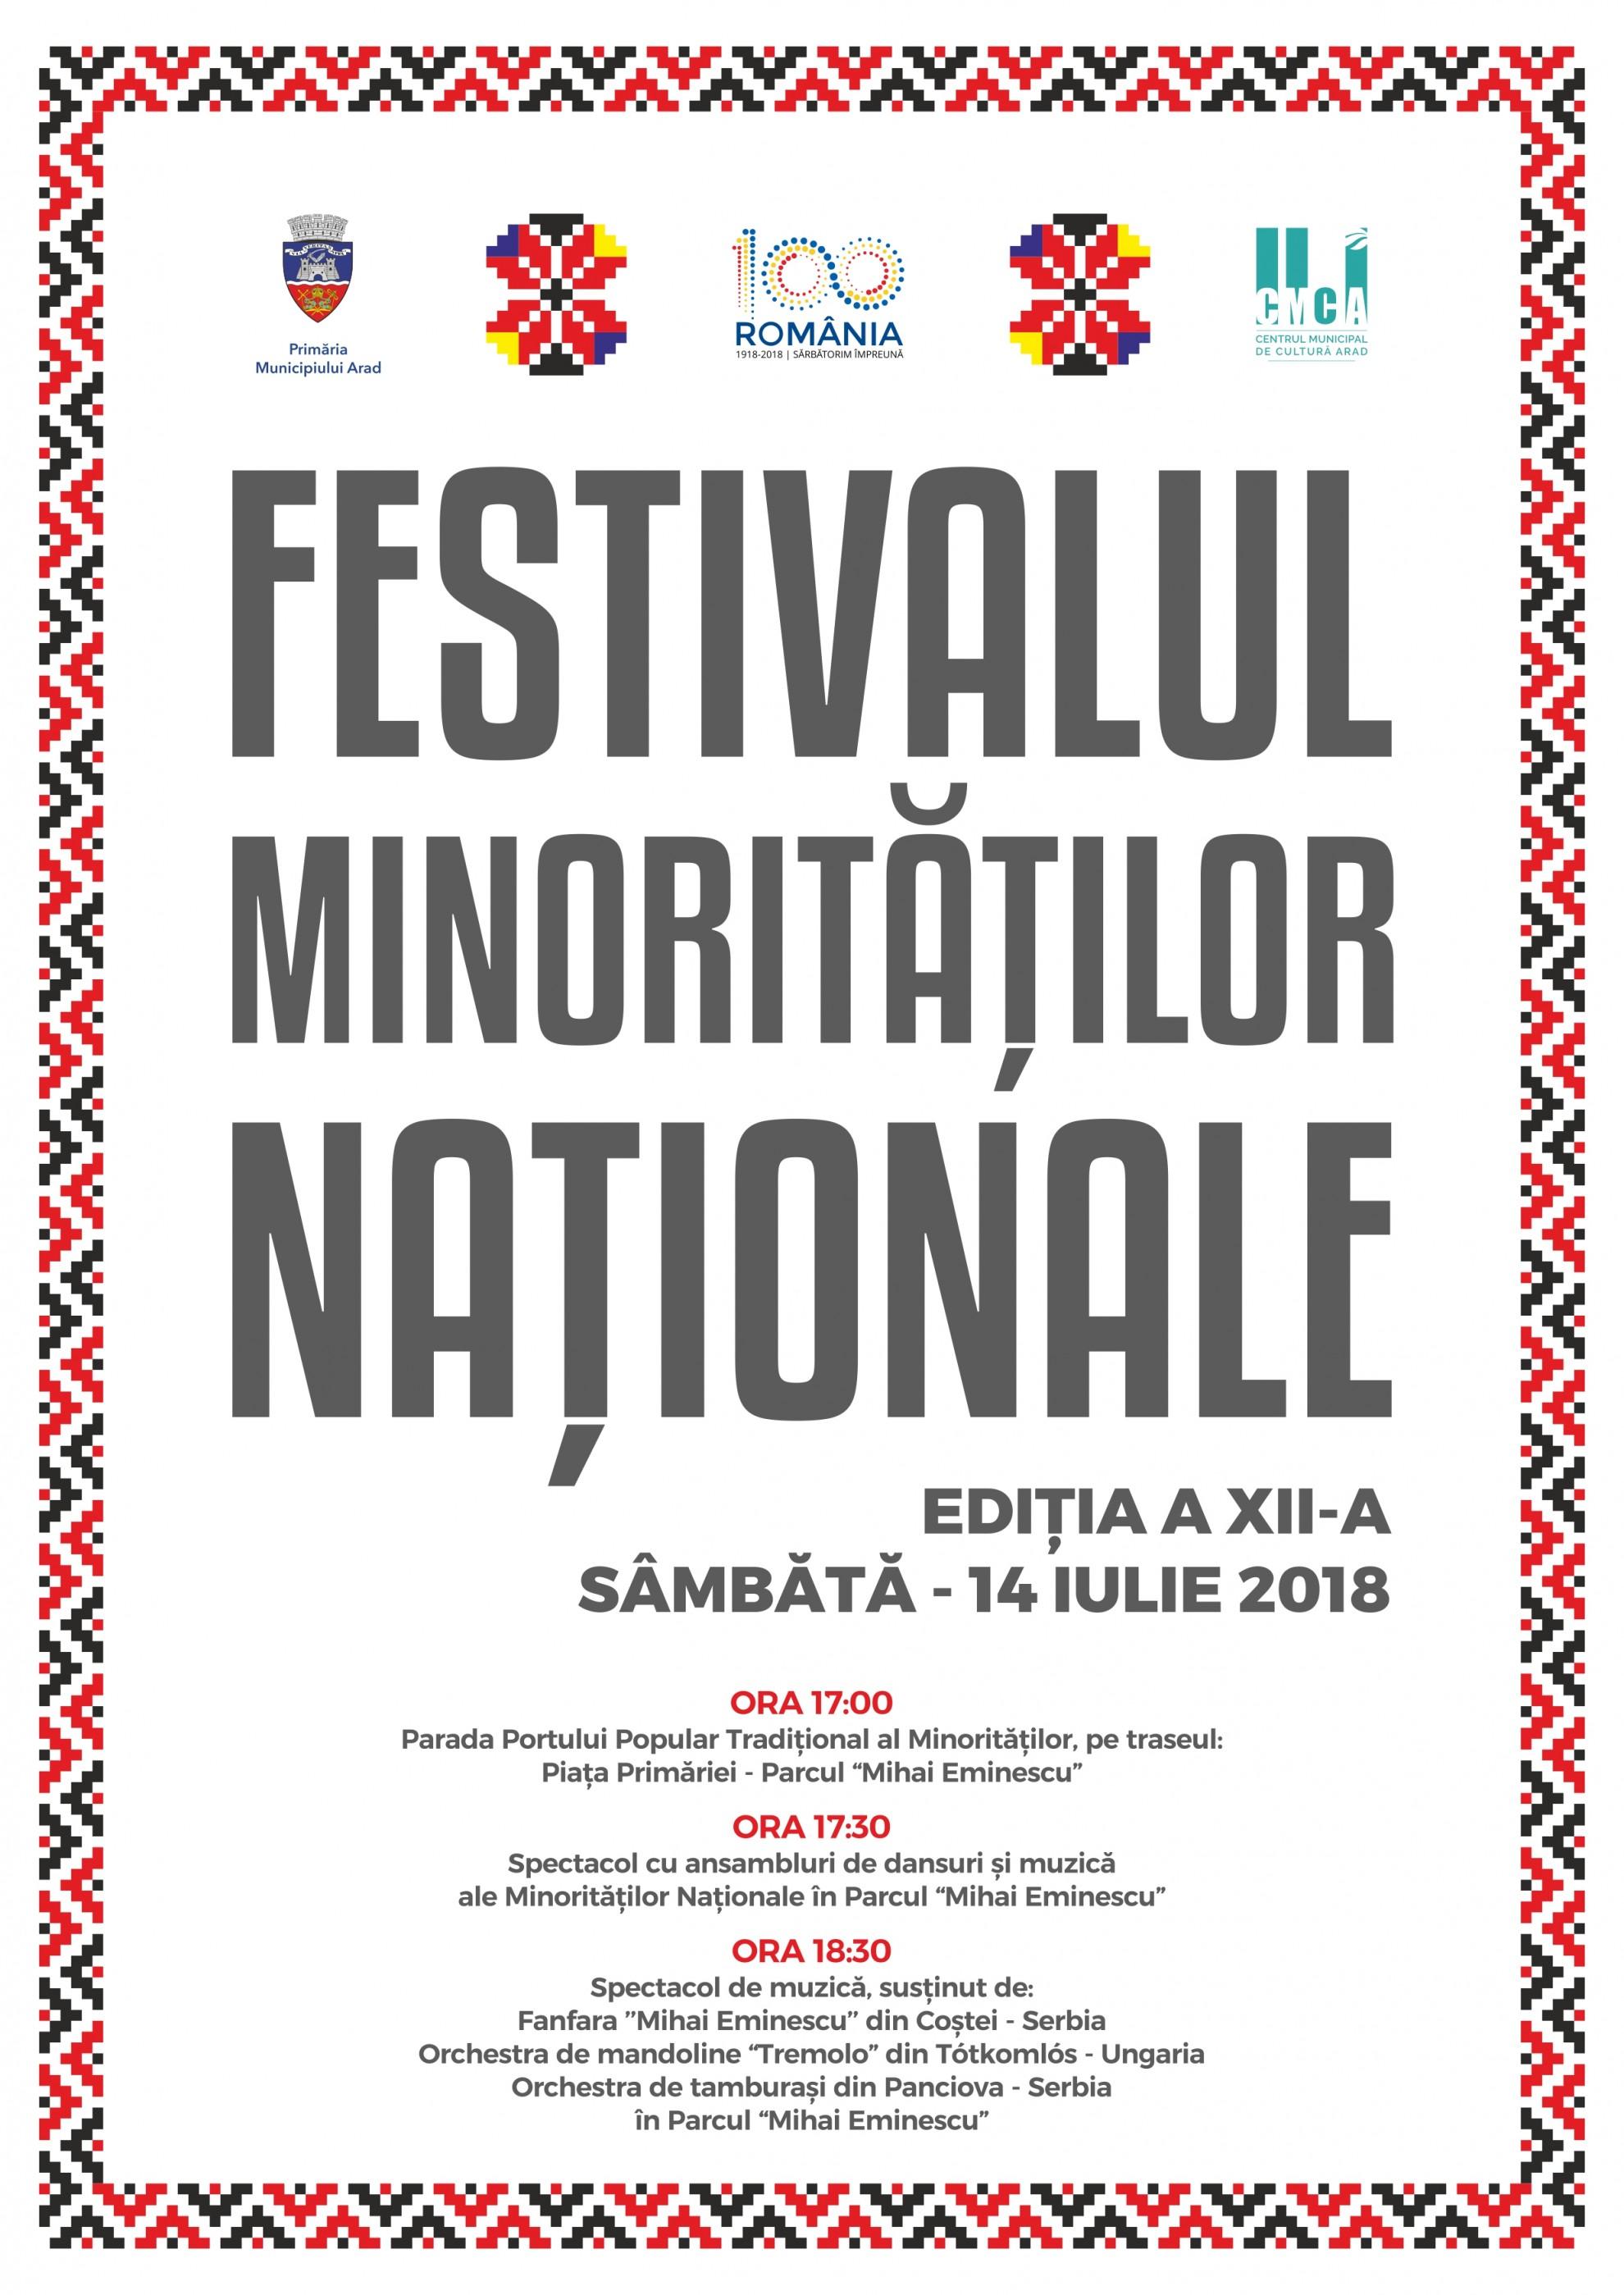 Festival of national minorities